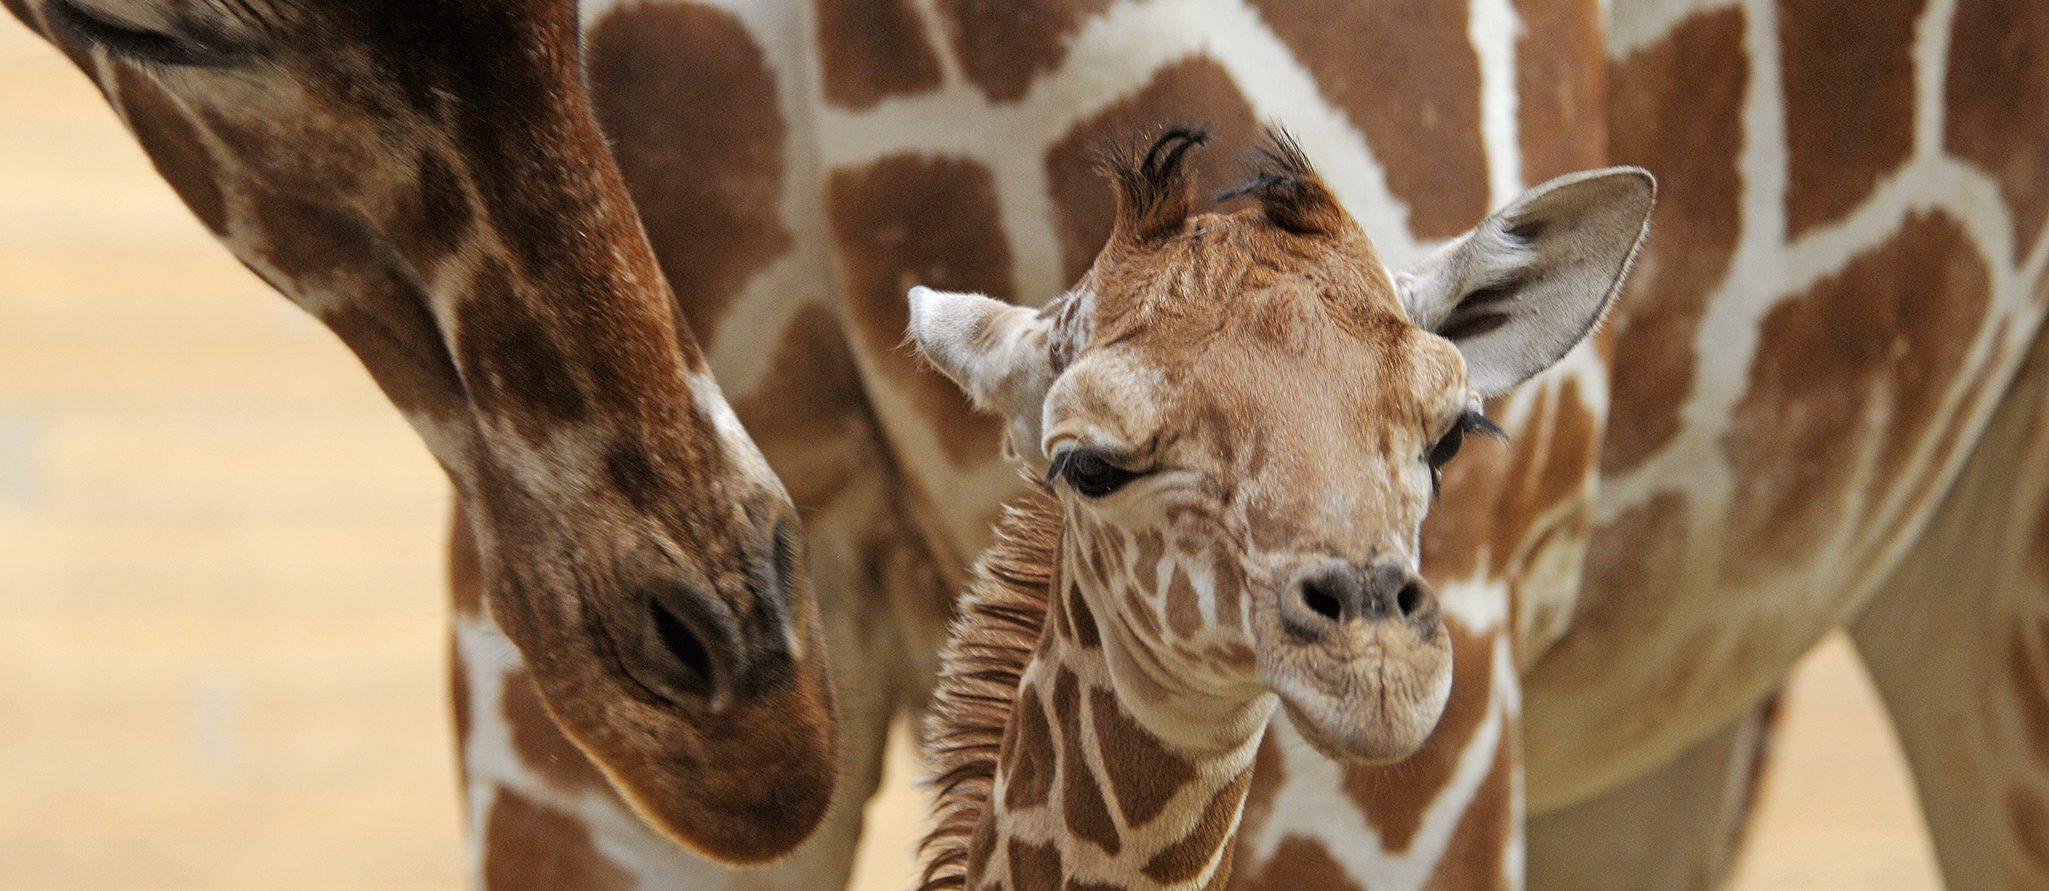 girafje Maartje (28 jan 2020)